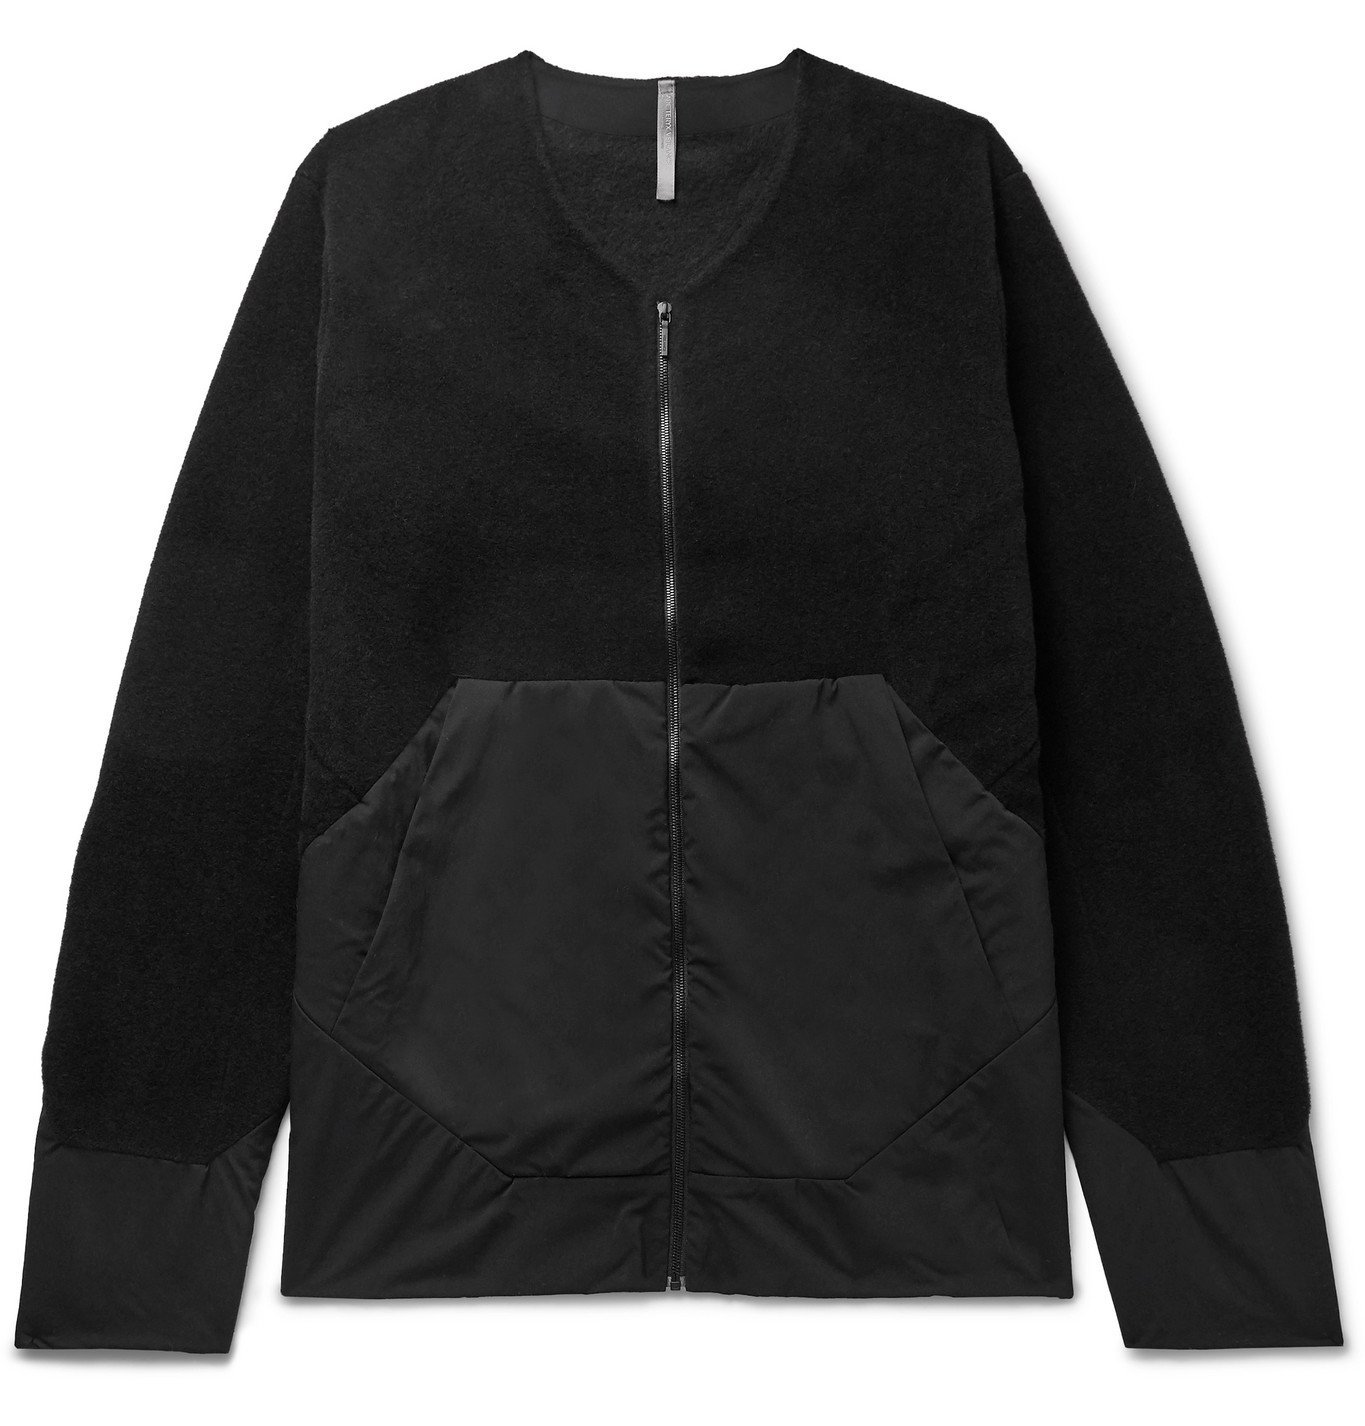 Veilance - Dinitz Comp Fleece and Stretch-Nylon Jacket - Black